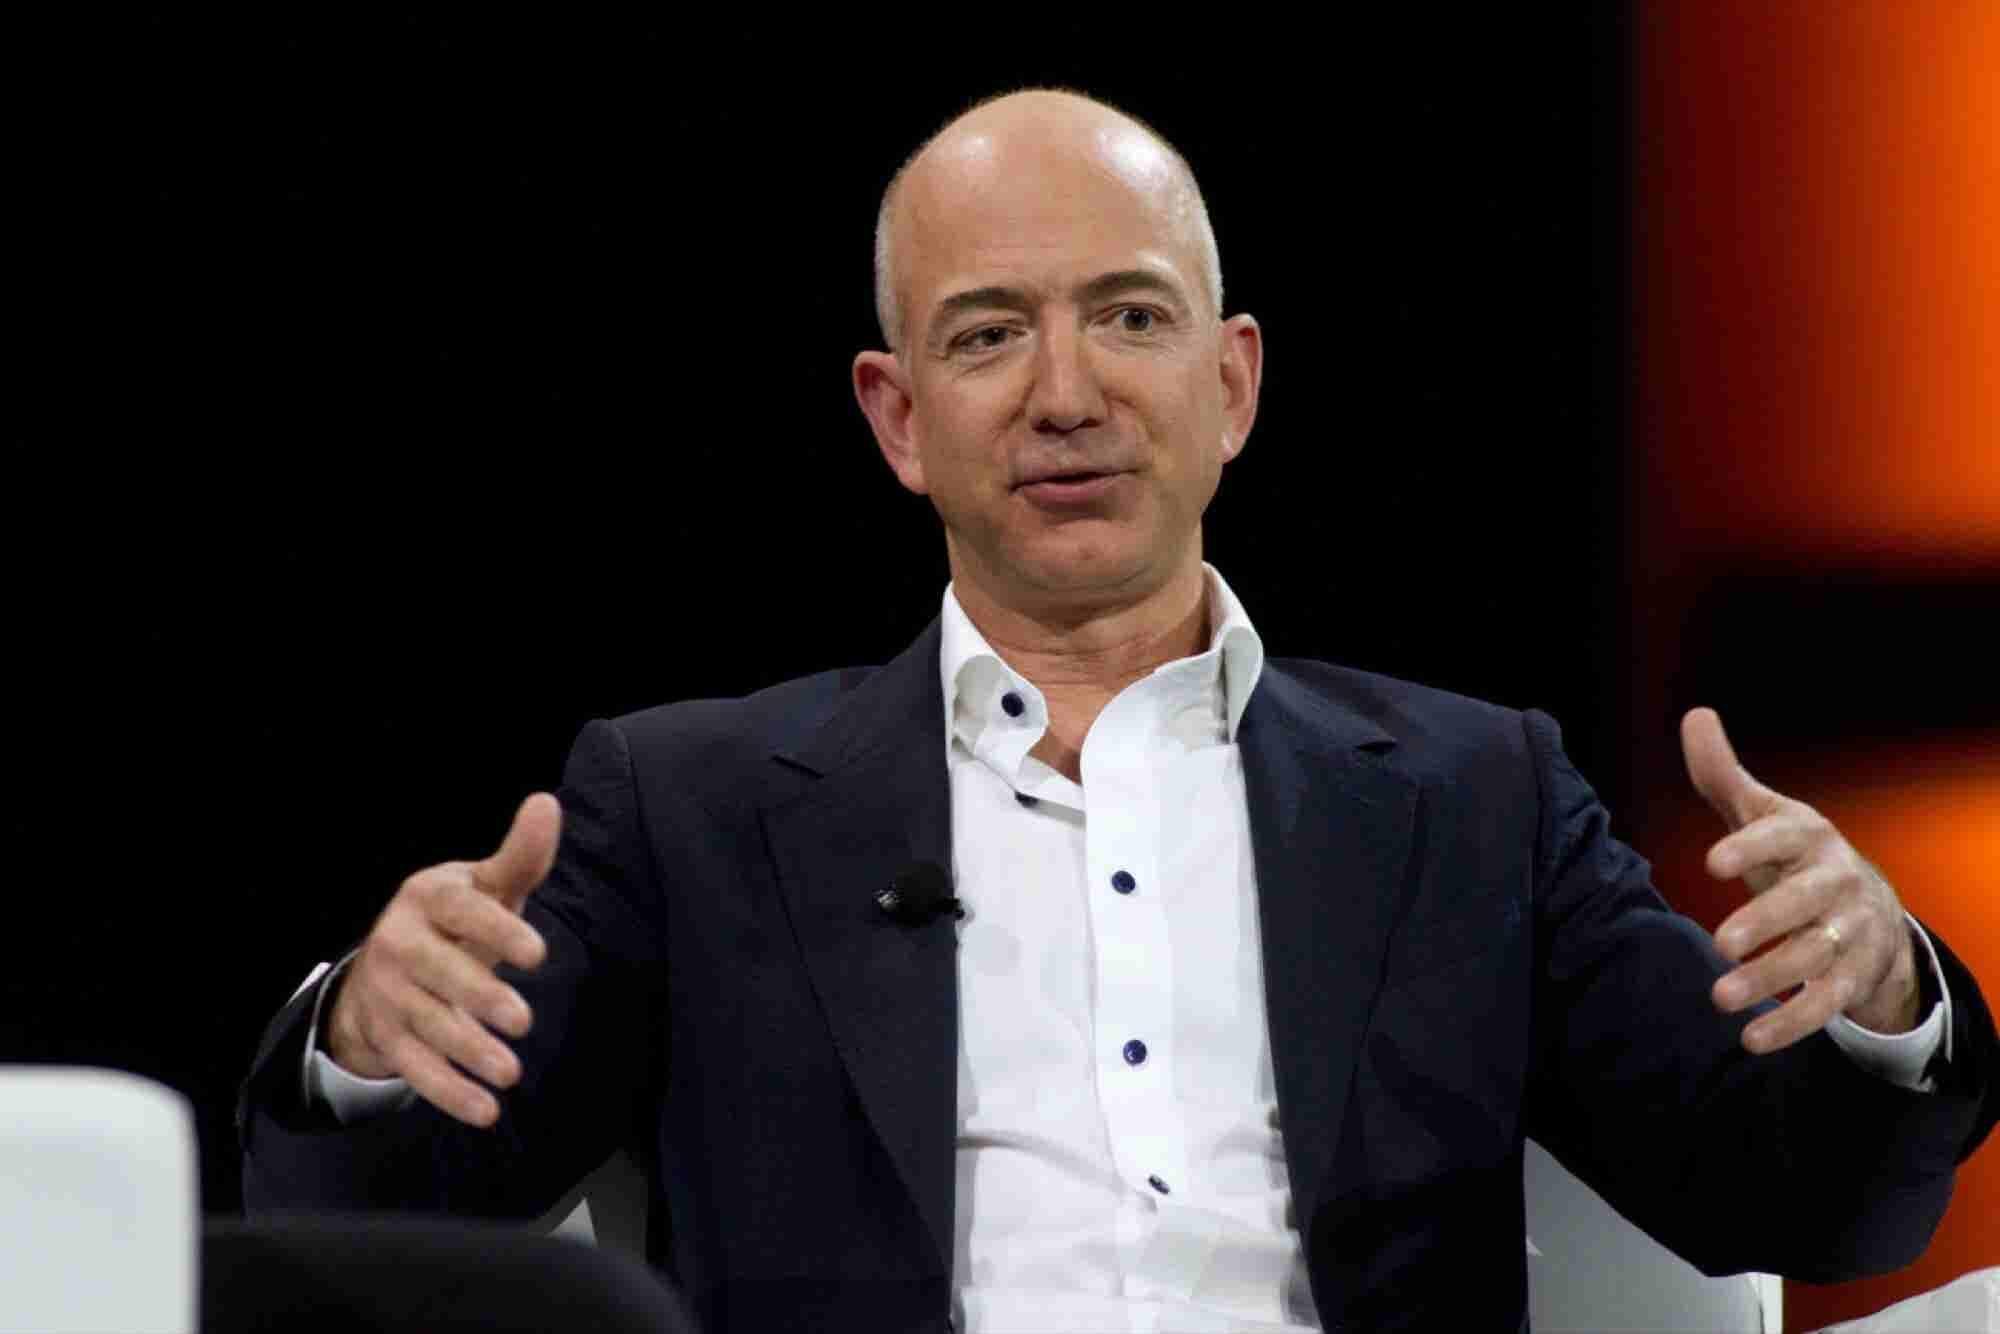 Jeff Bezos' Rocket Company Test-Flies Suborbital Spaceship